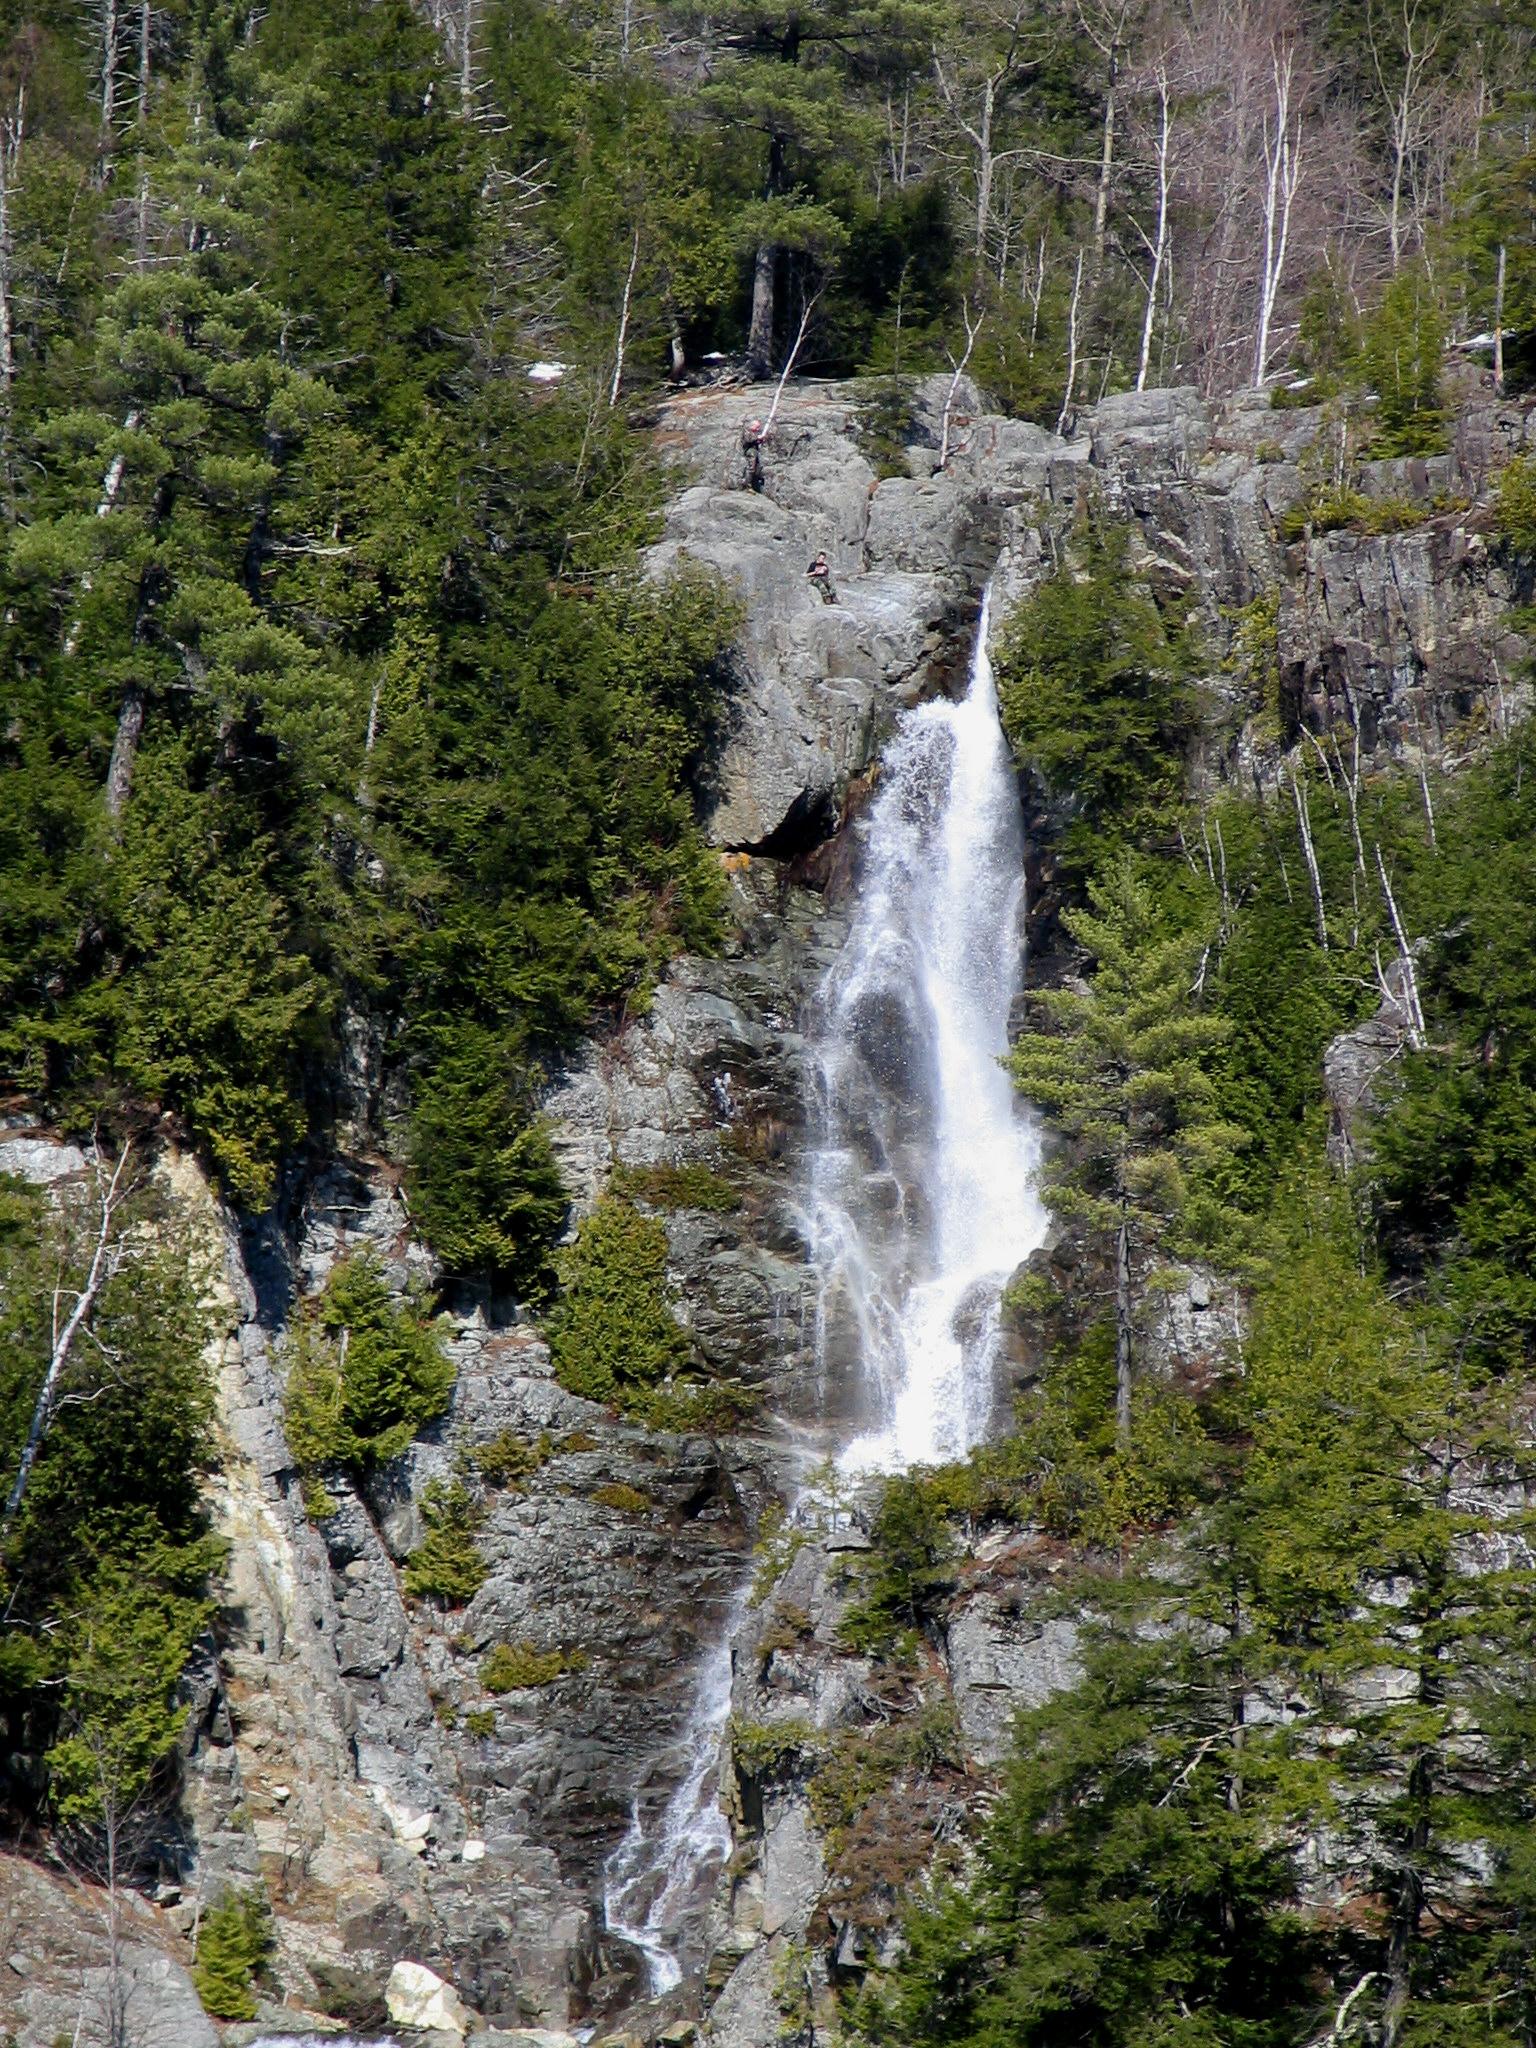 New york essex county keene - File Roaring Brook Falls St Huberts Ny Jpg